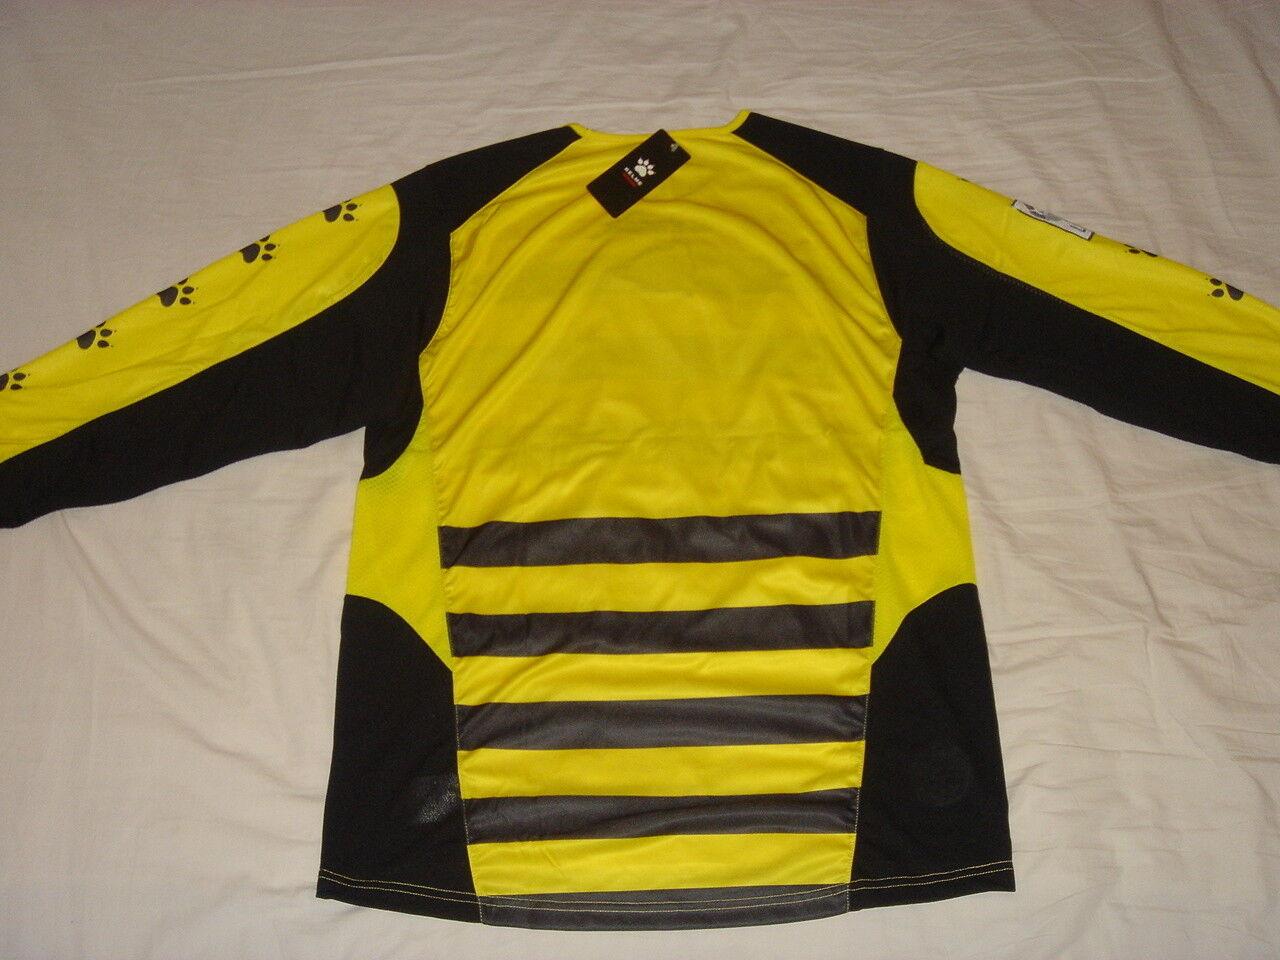 Camiseta Camiseta Camiseta de fútbol Alaves Kelme Nueva  XL 3f71e1